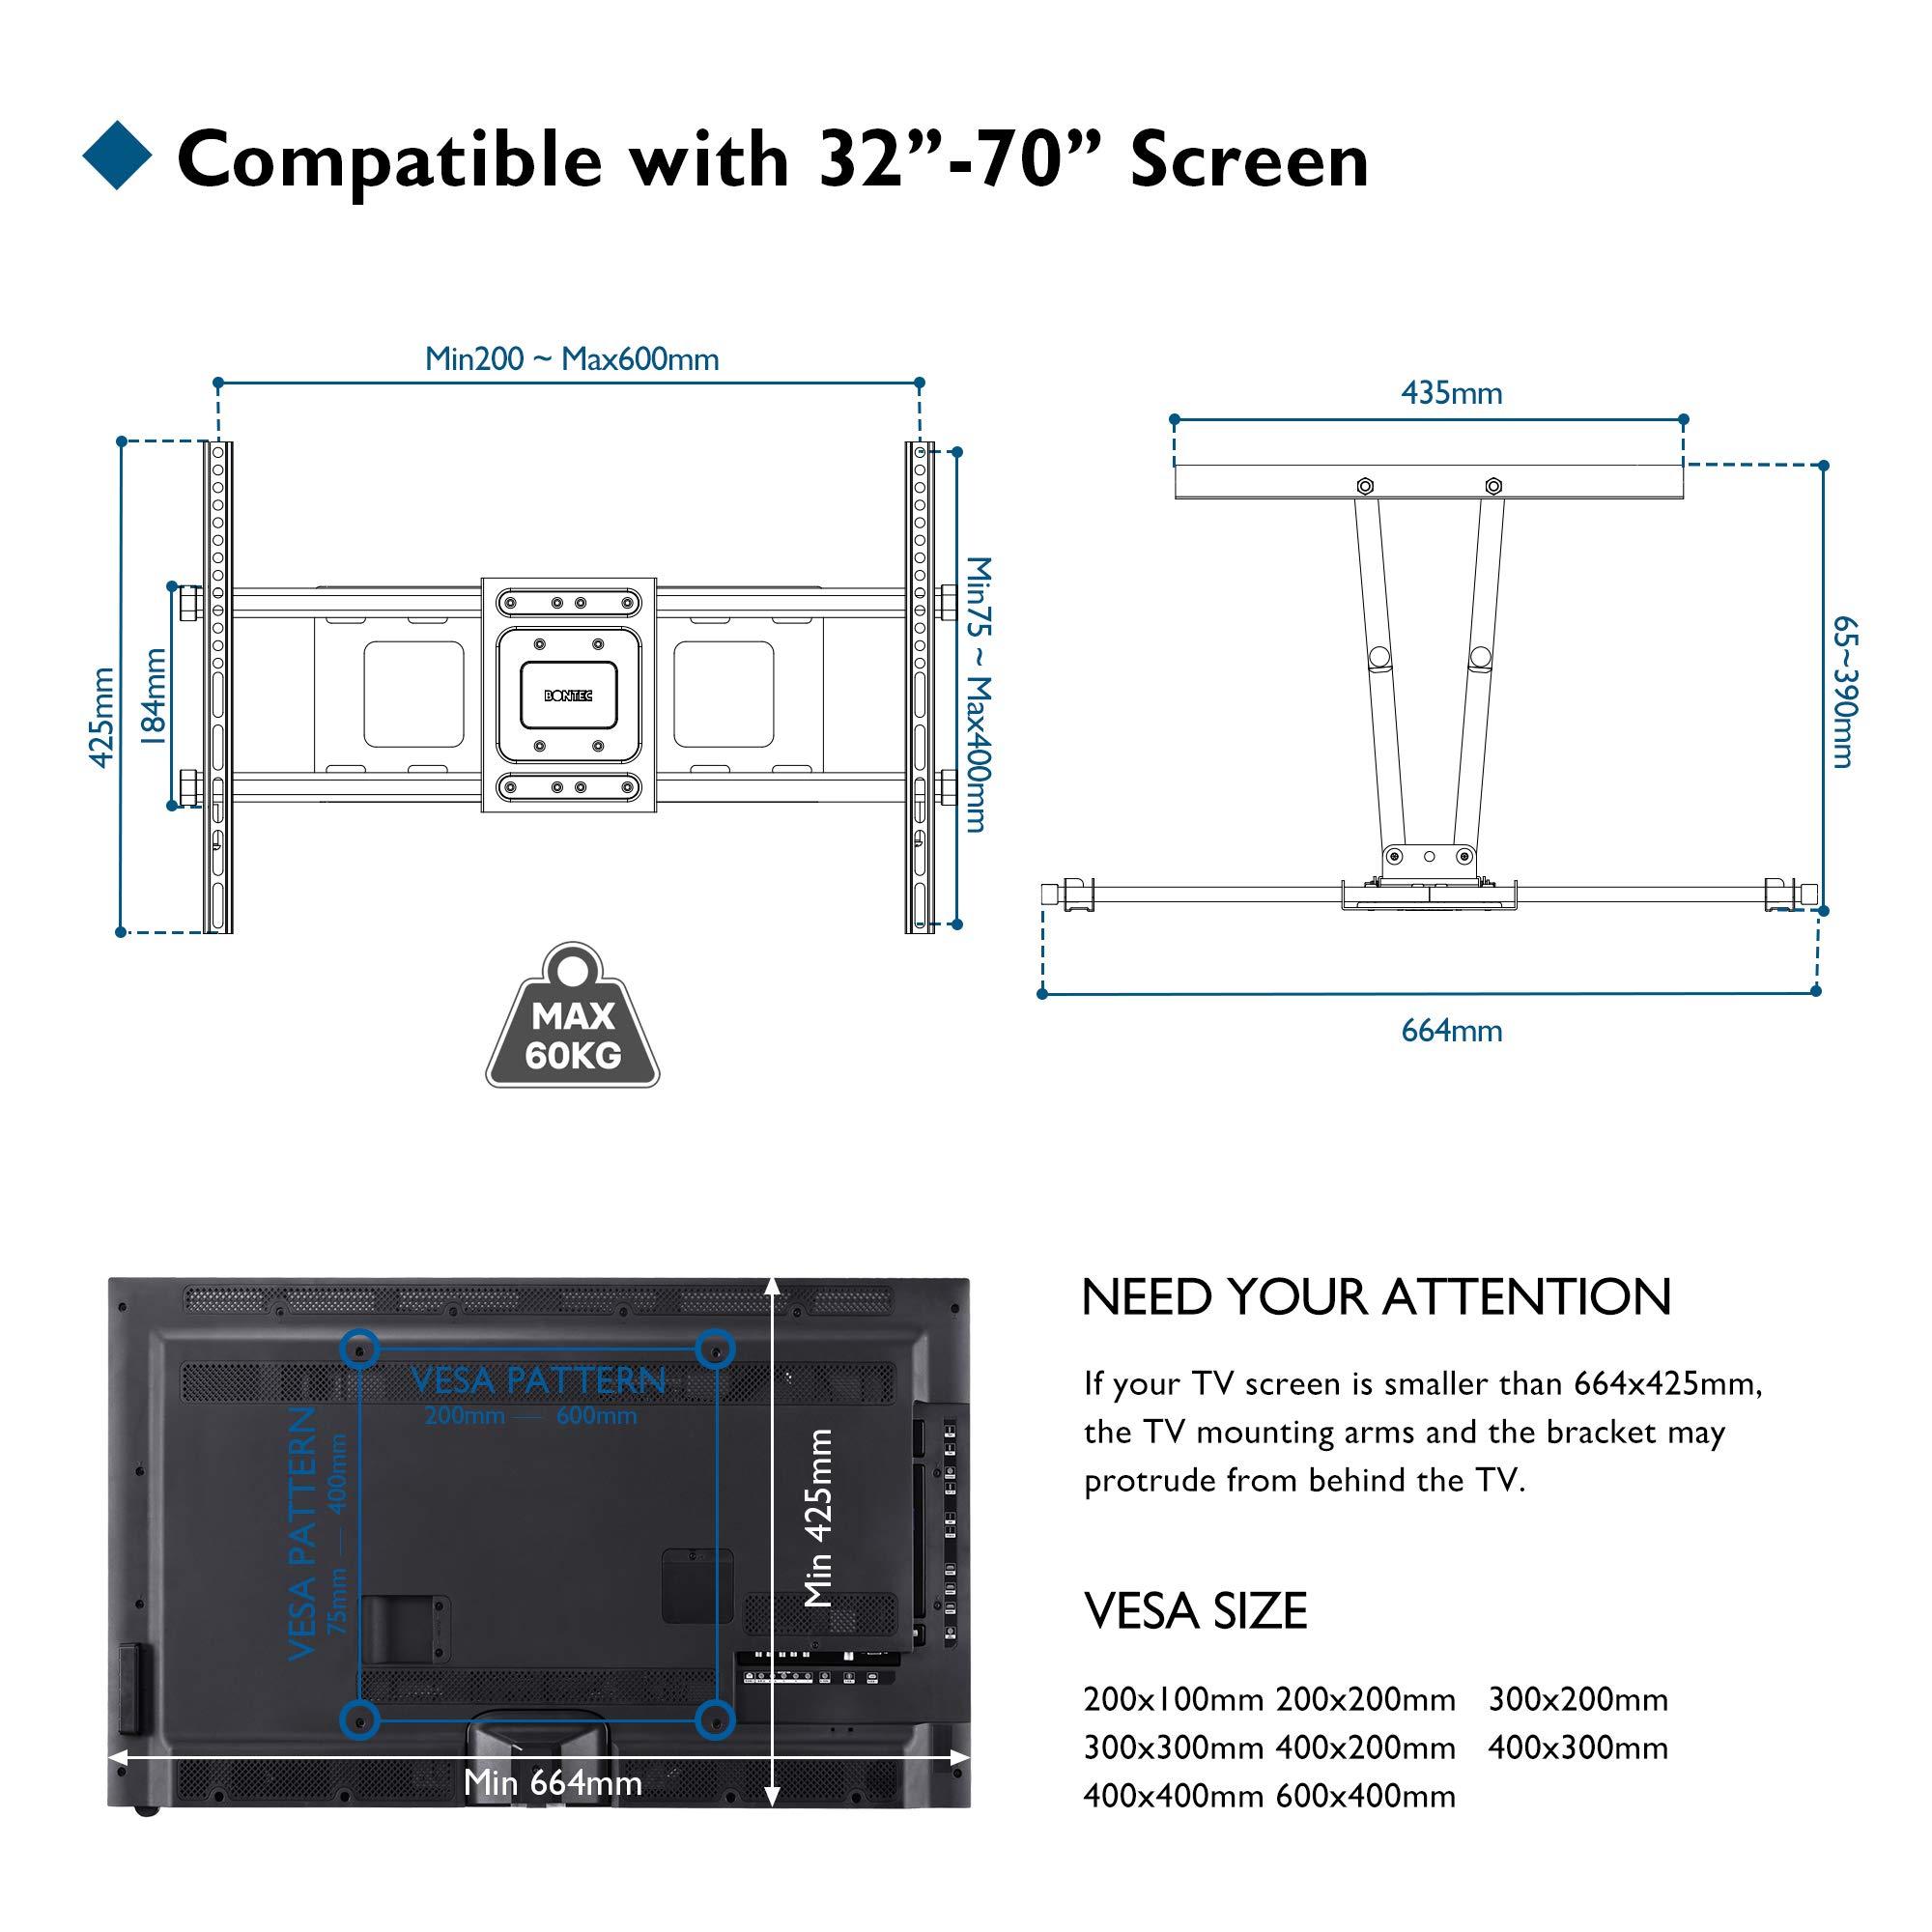 BONTEC Soporte Universal de Pedestal de Televisor con Soporte para Televisor de 26